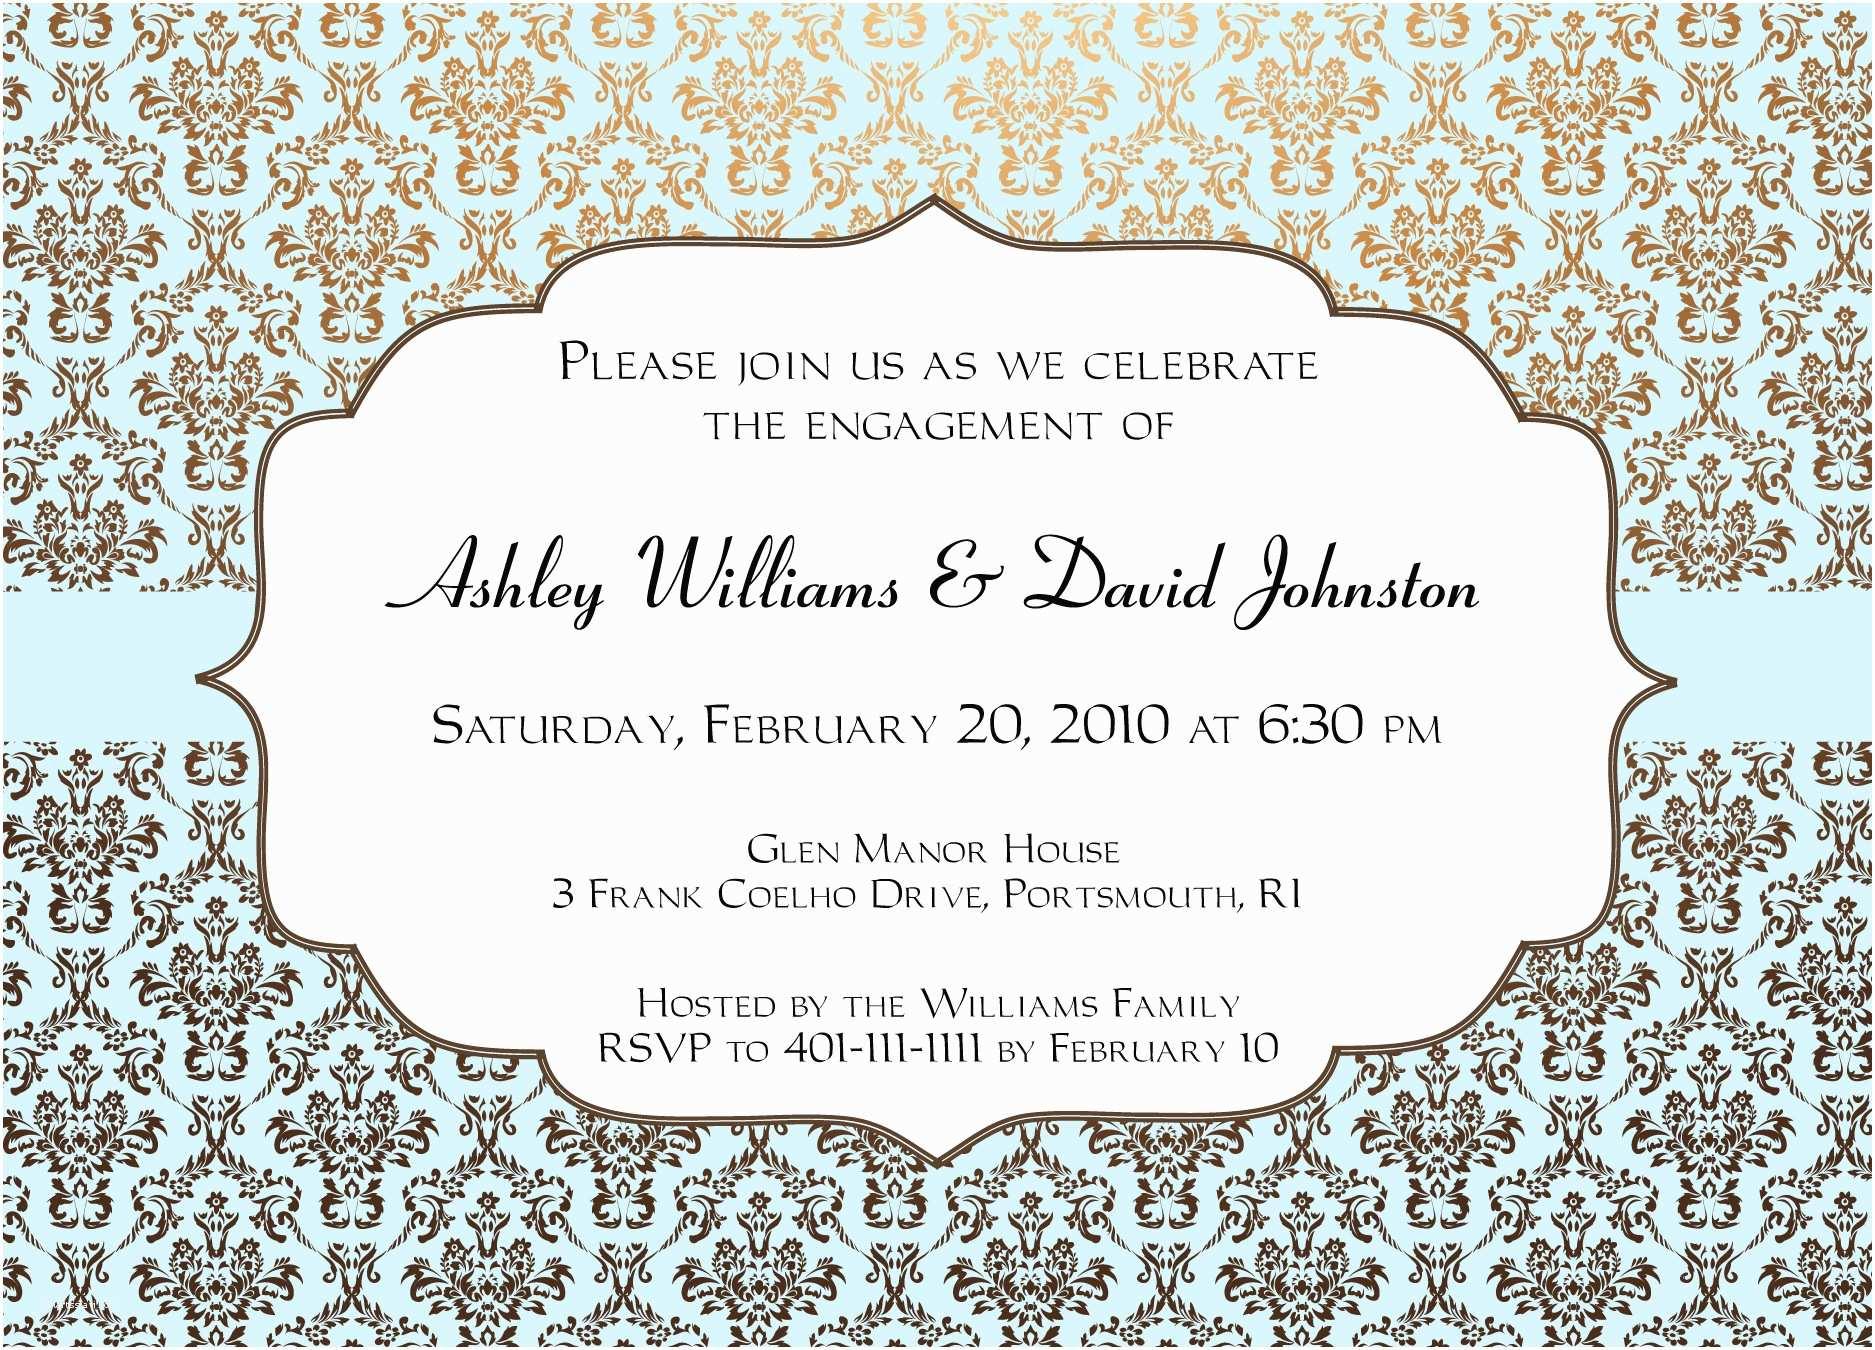 Engagement Party Invitations Templates Engagement Invitation Design